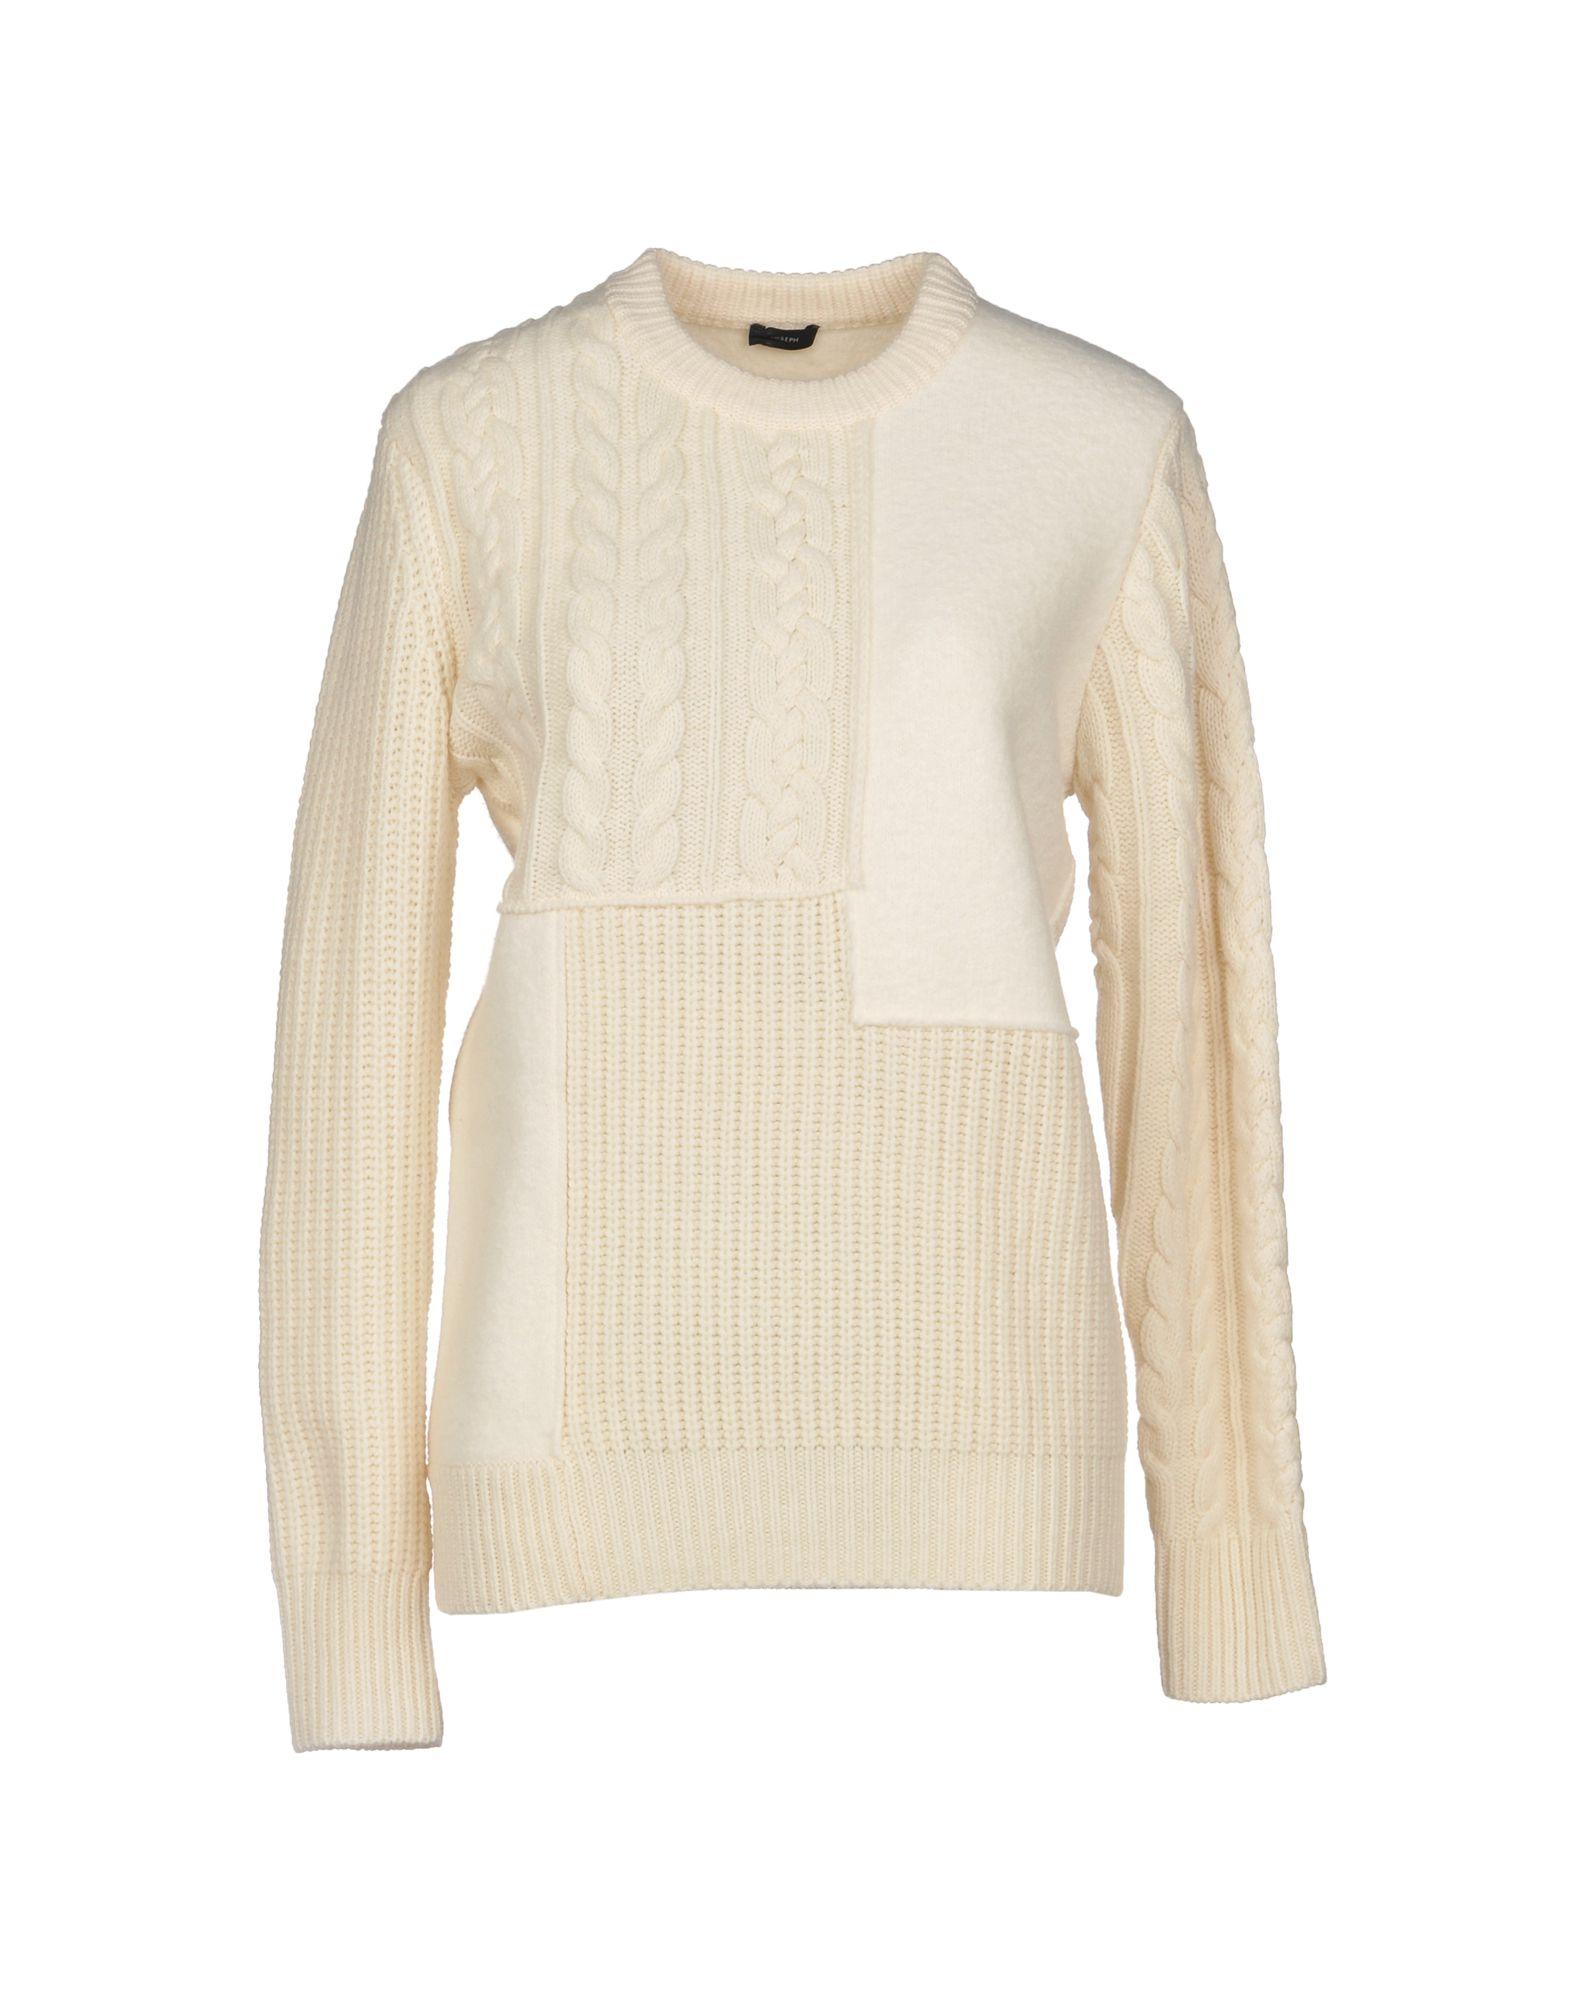 JOSEPH Sweaters - Item 39880883